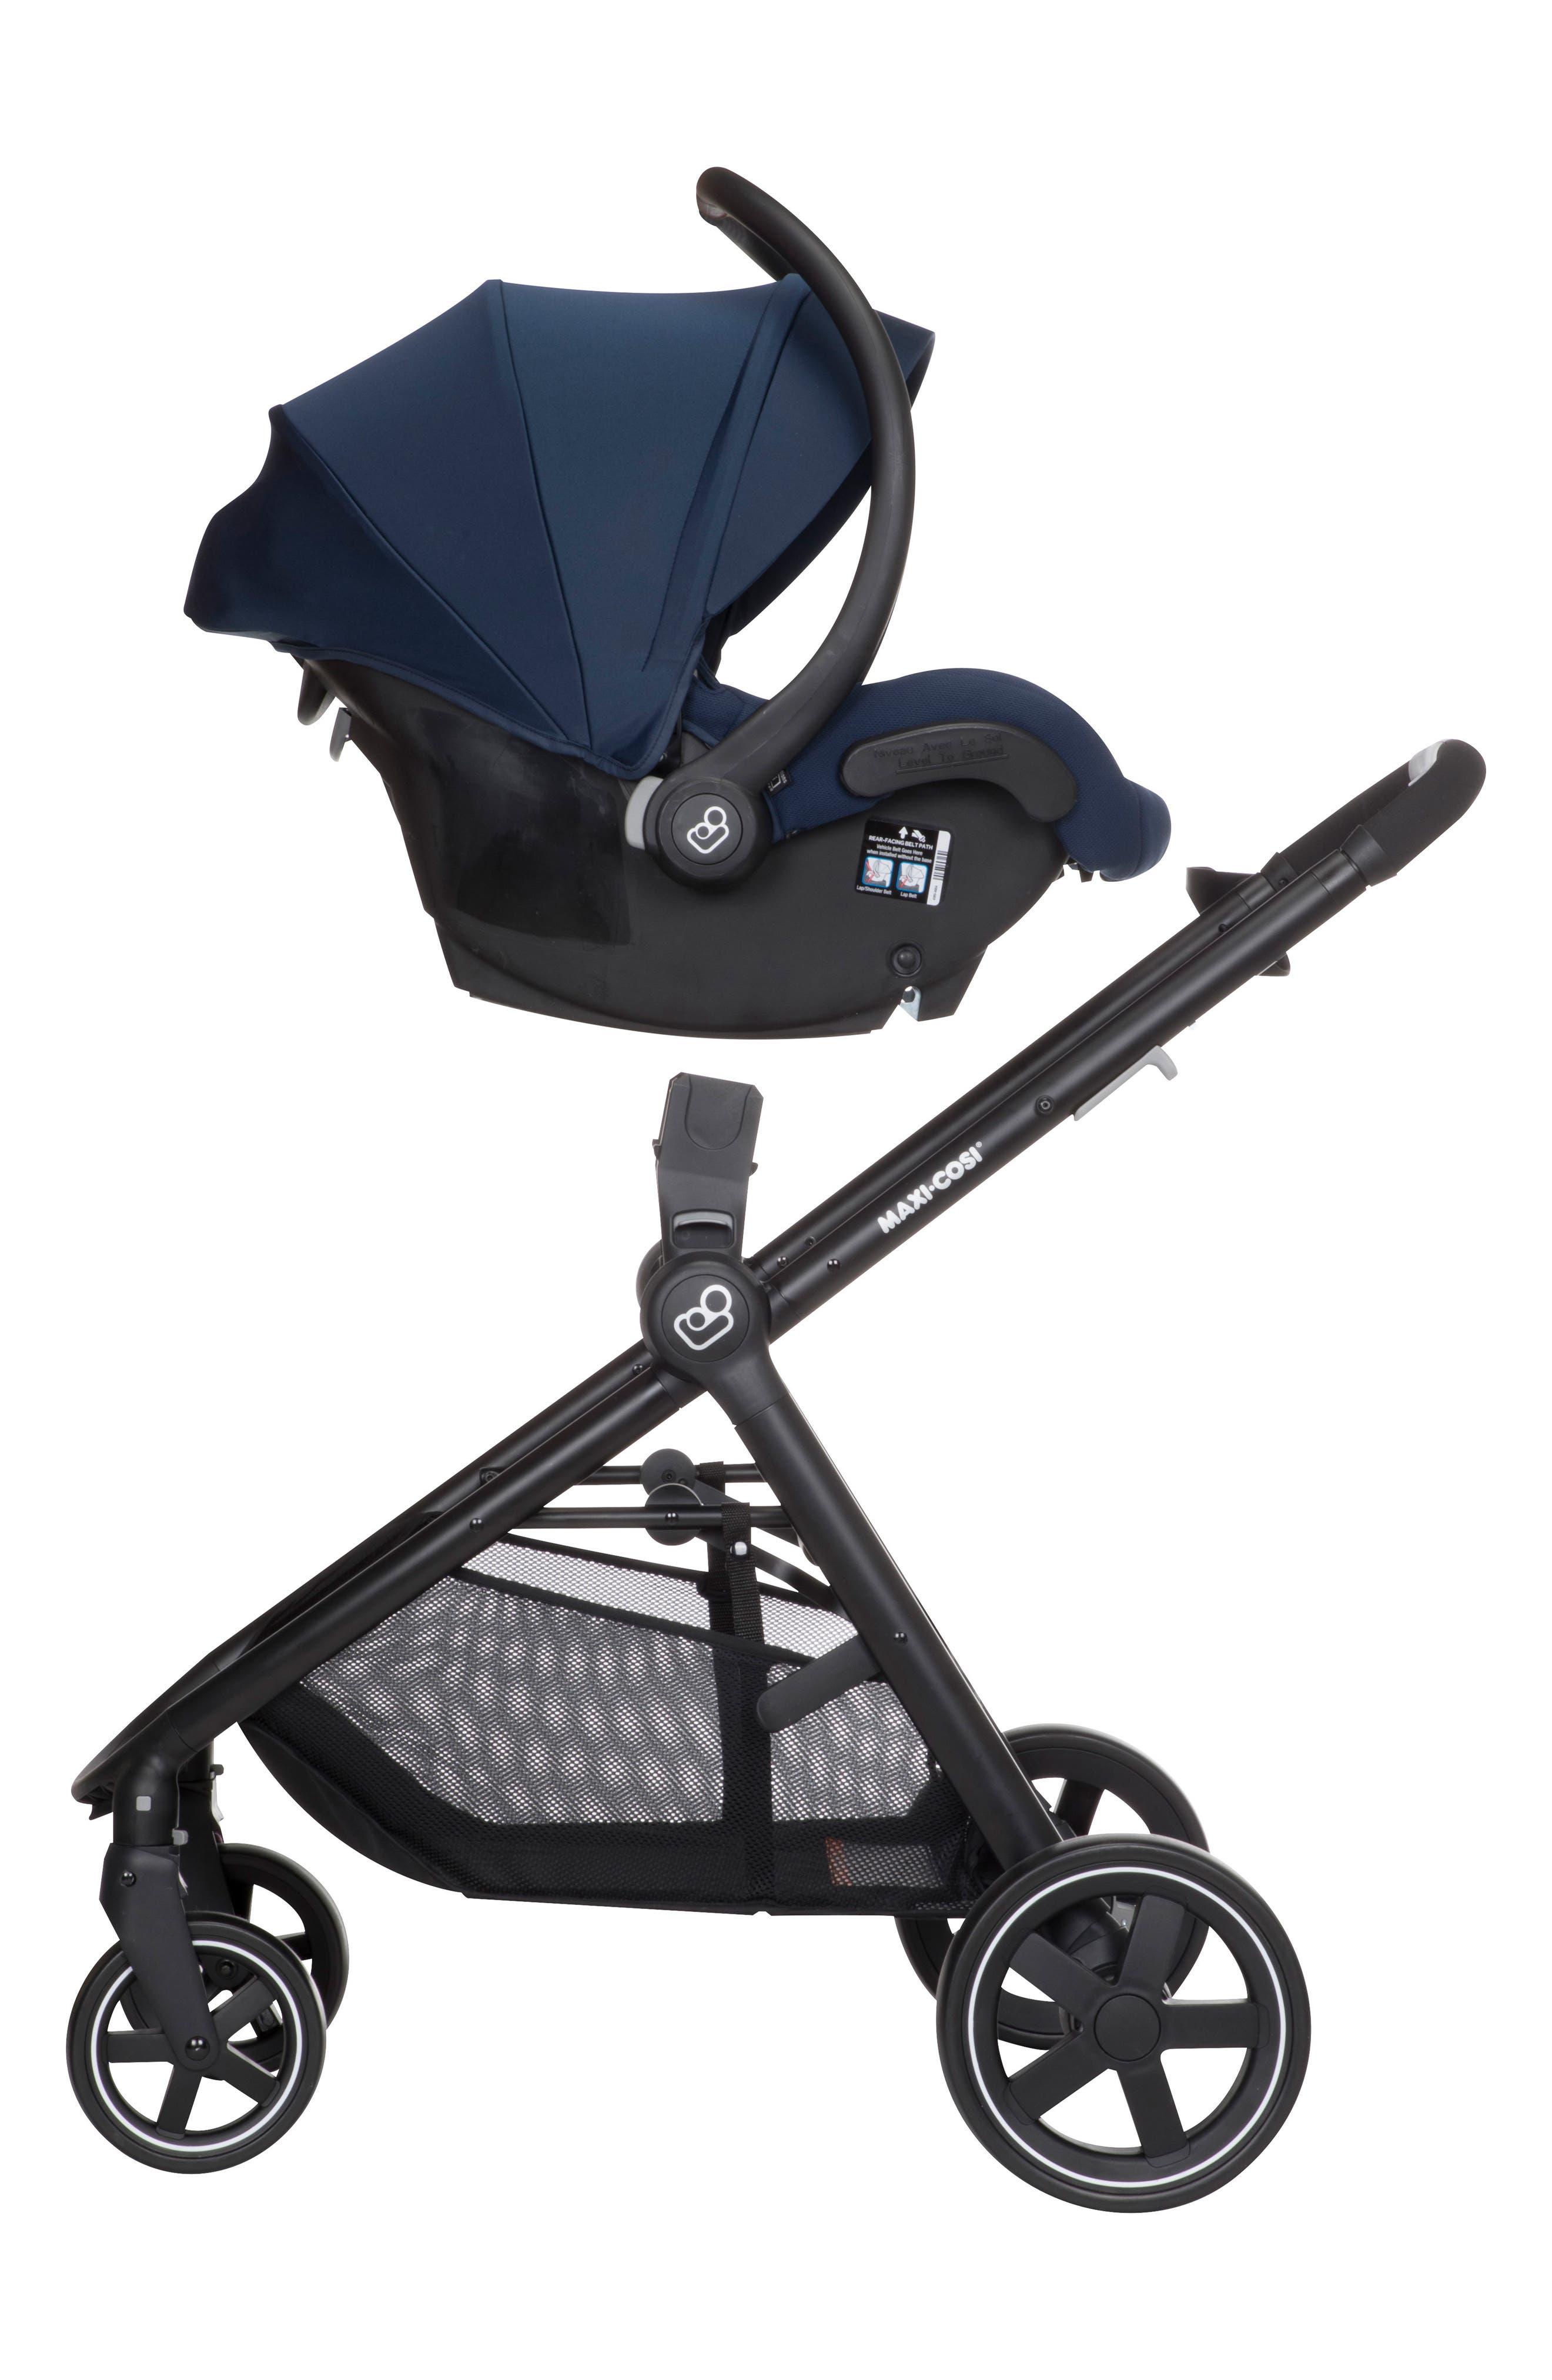 5-1 Mico 30 Infant Car Seat & Zelia Stroller Modular Travel System,                             Alternate thumbnail 13, color,                             NIGHT BLACK